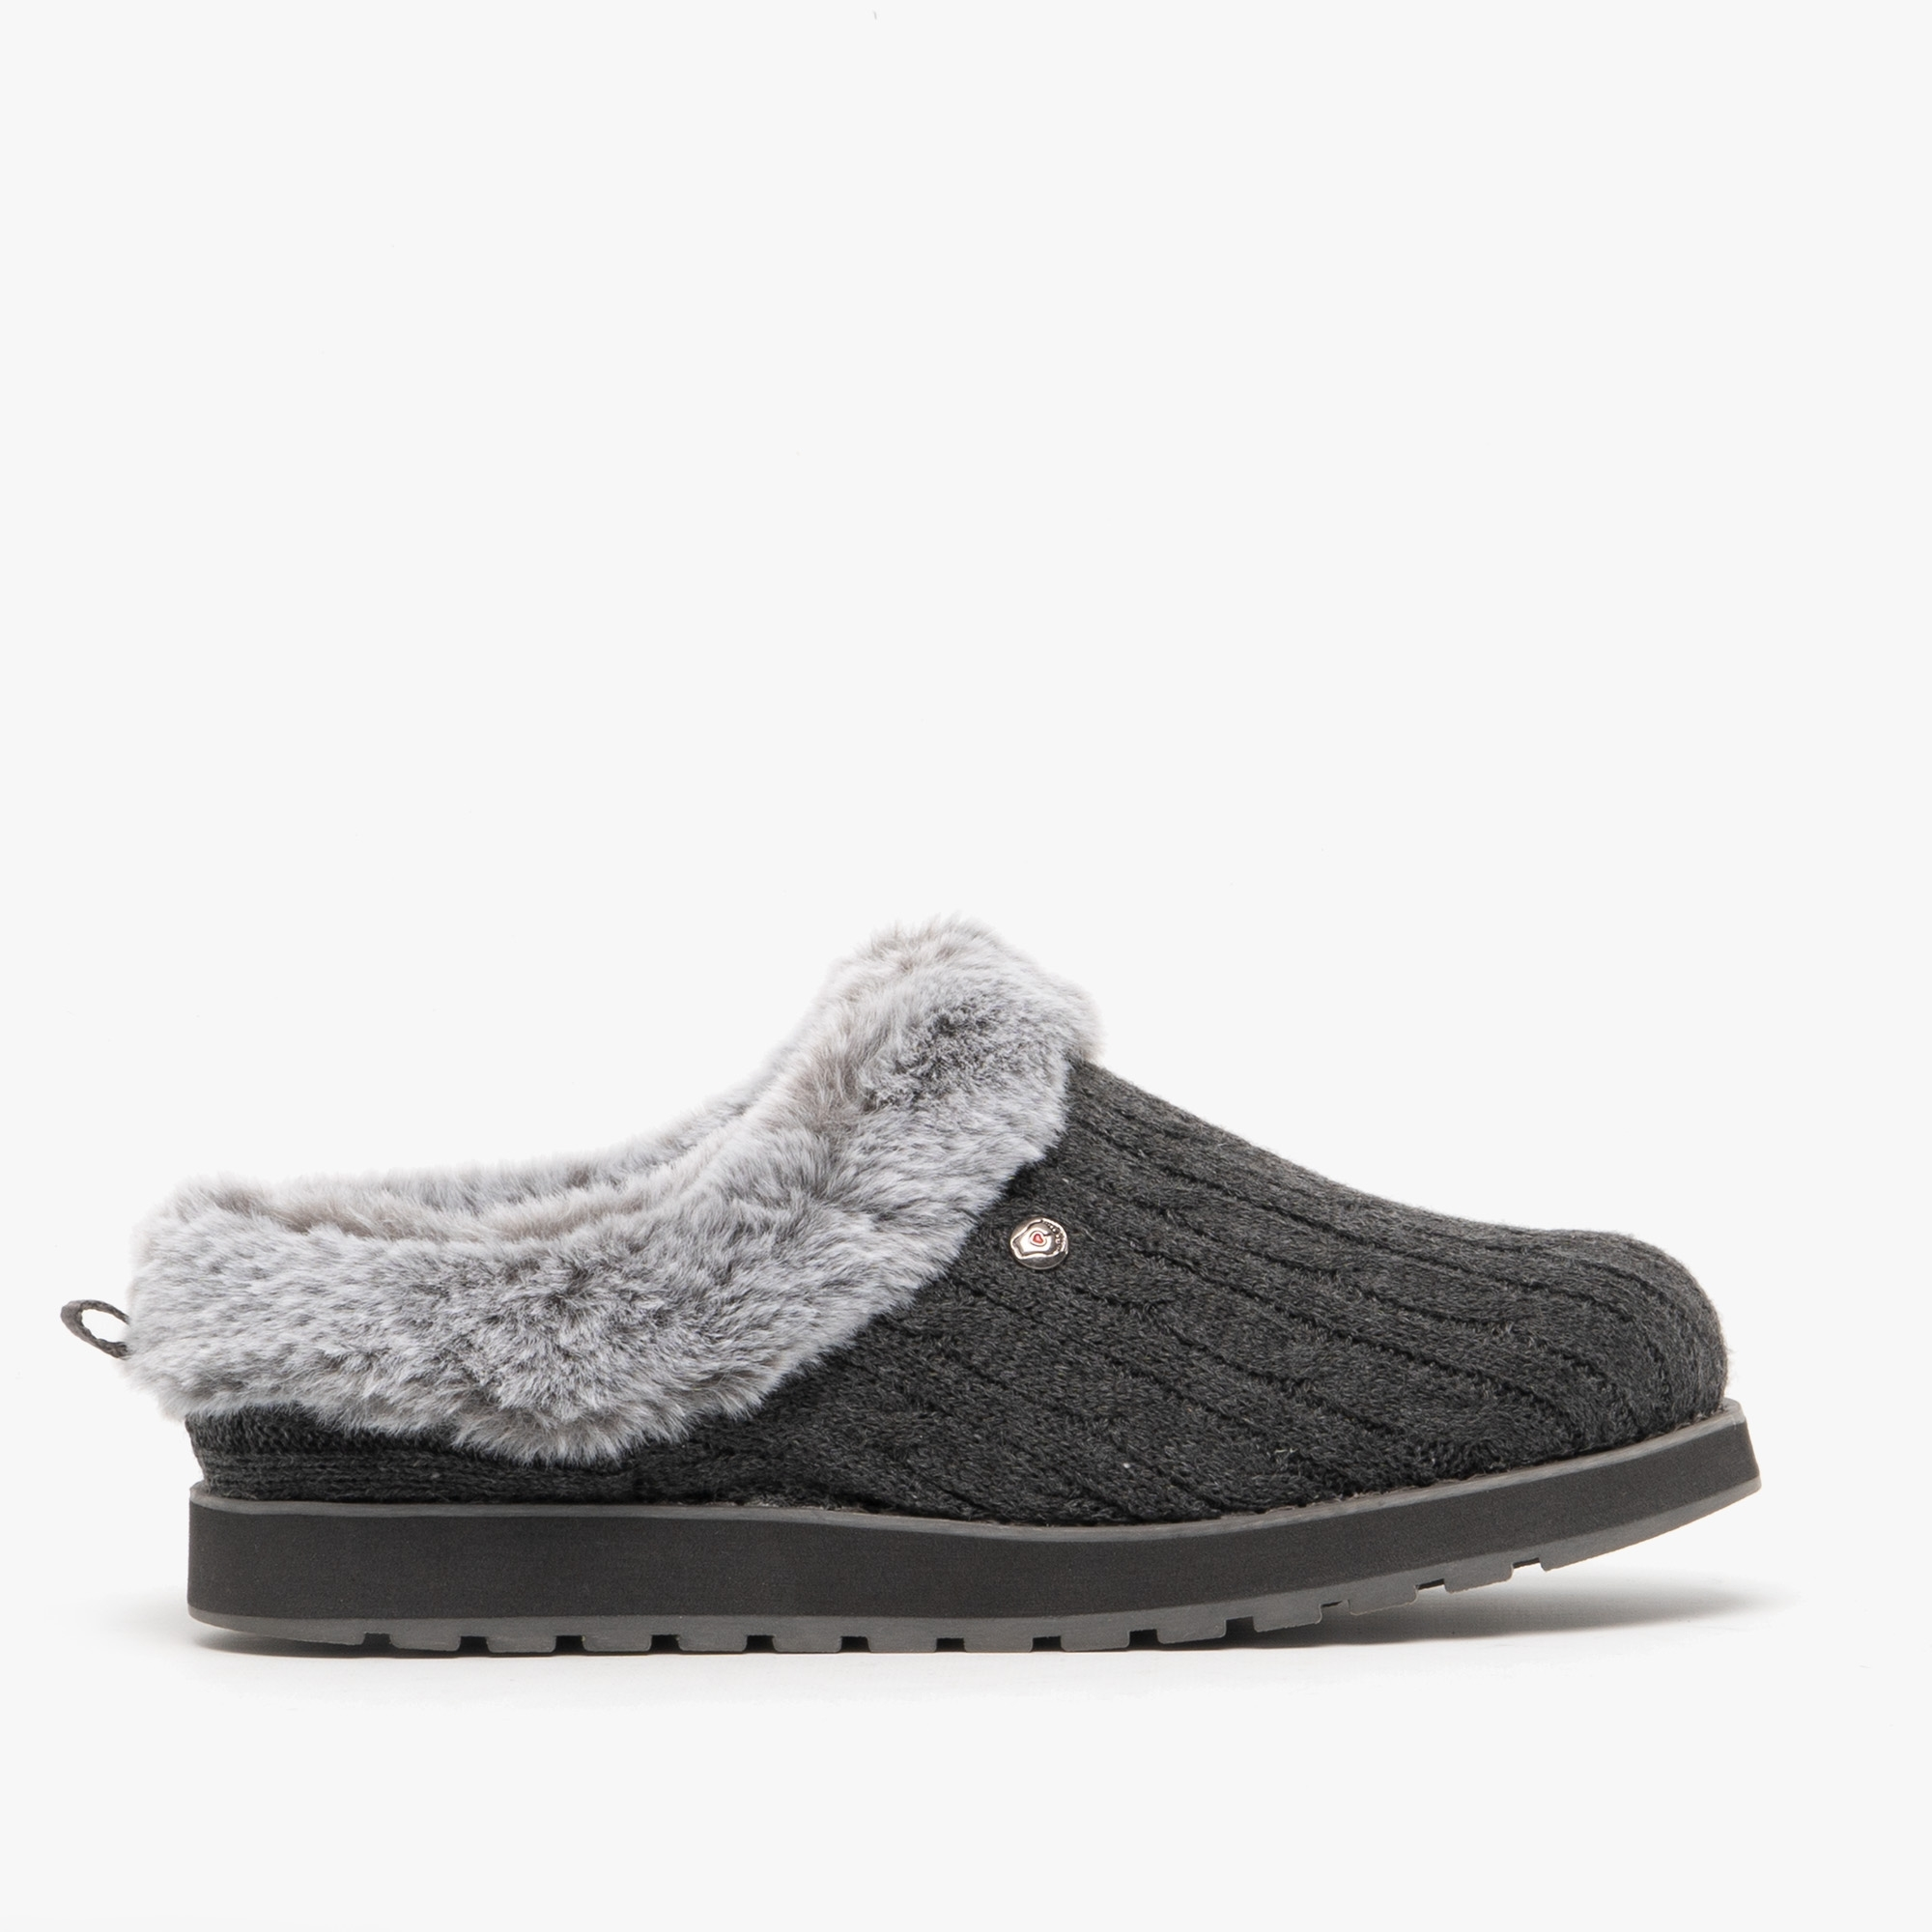 sketcher slippers